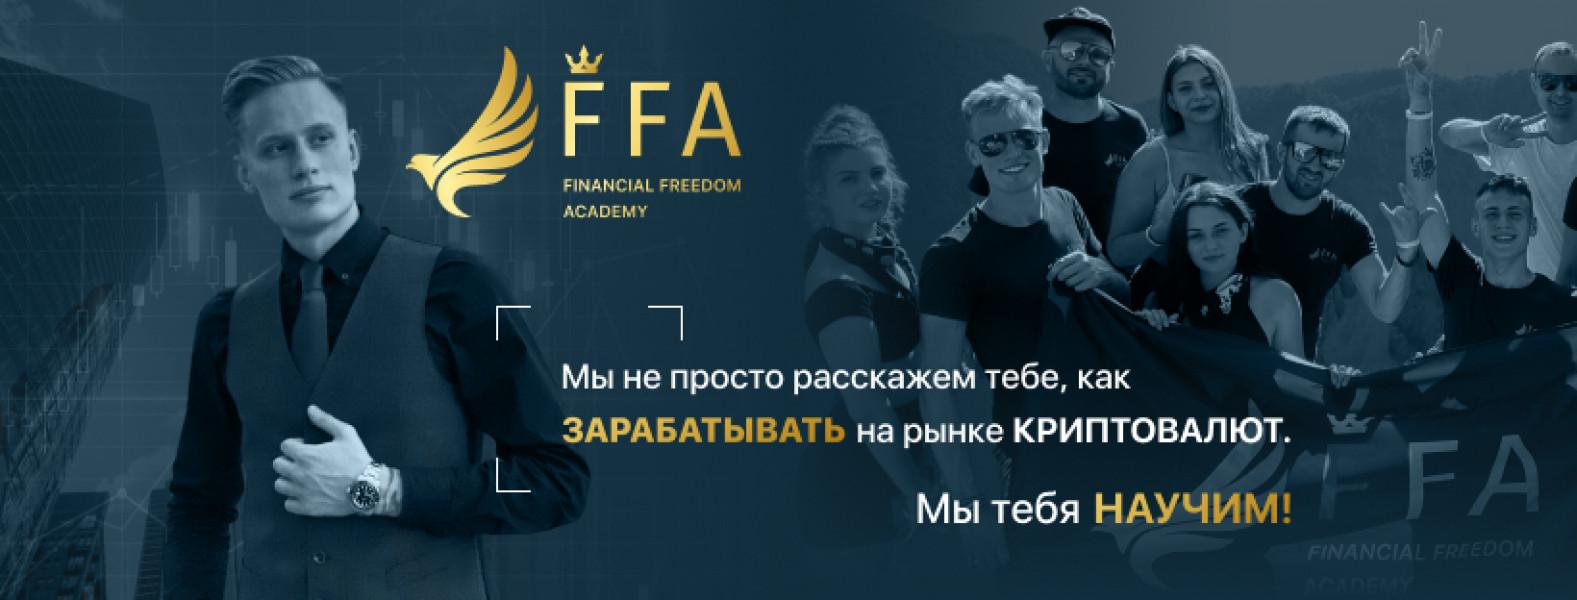 Facebook header for FFA